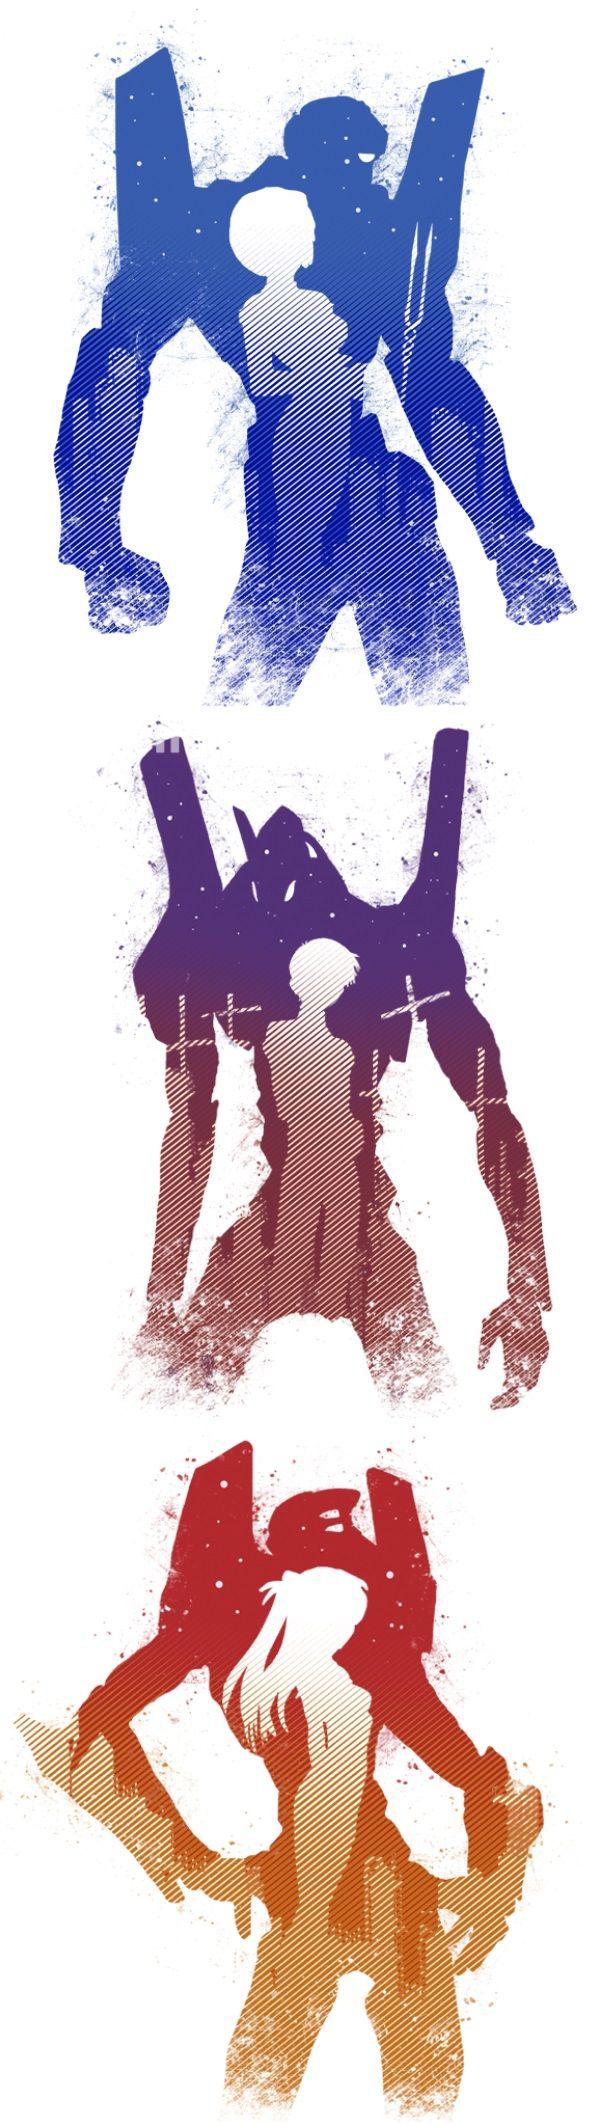 Evangelion Anime EVA 00 EVA 01 EVA 02 - Группы - Галерея - Форум Evangelion Not End